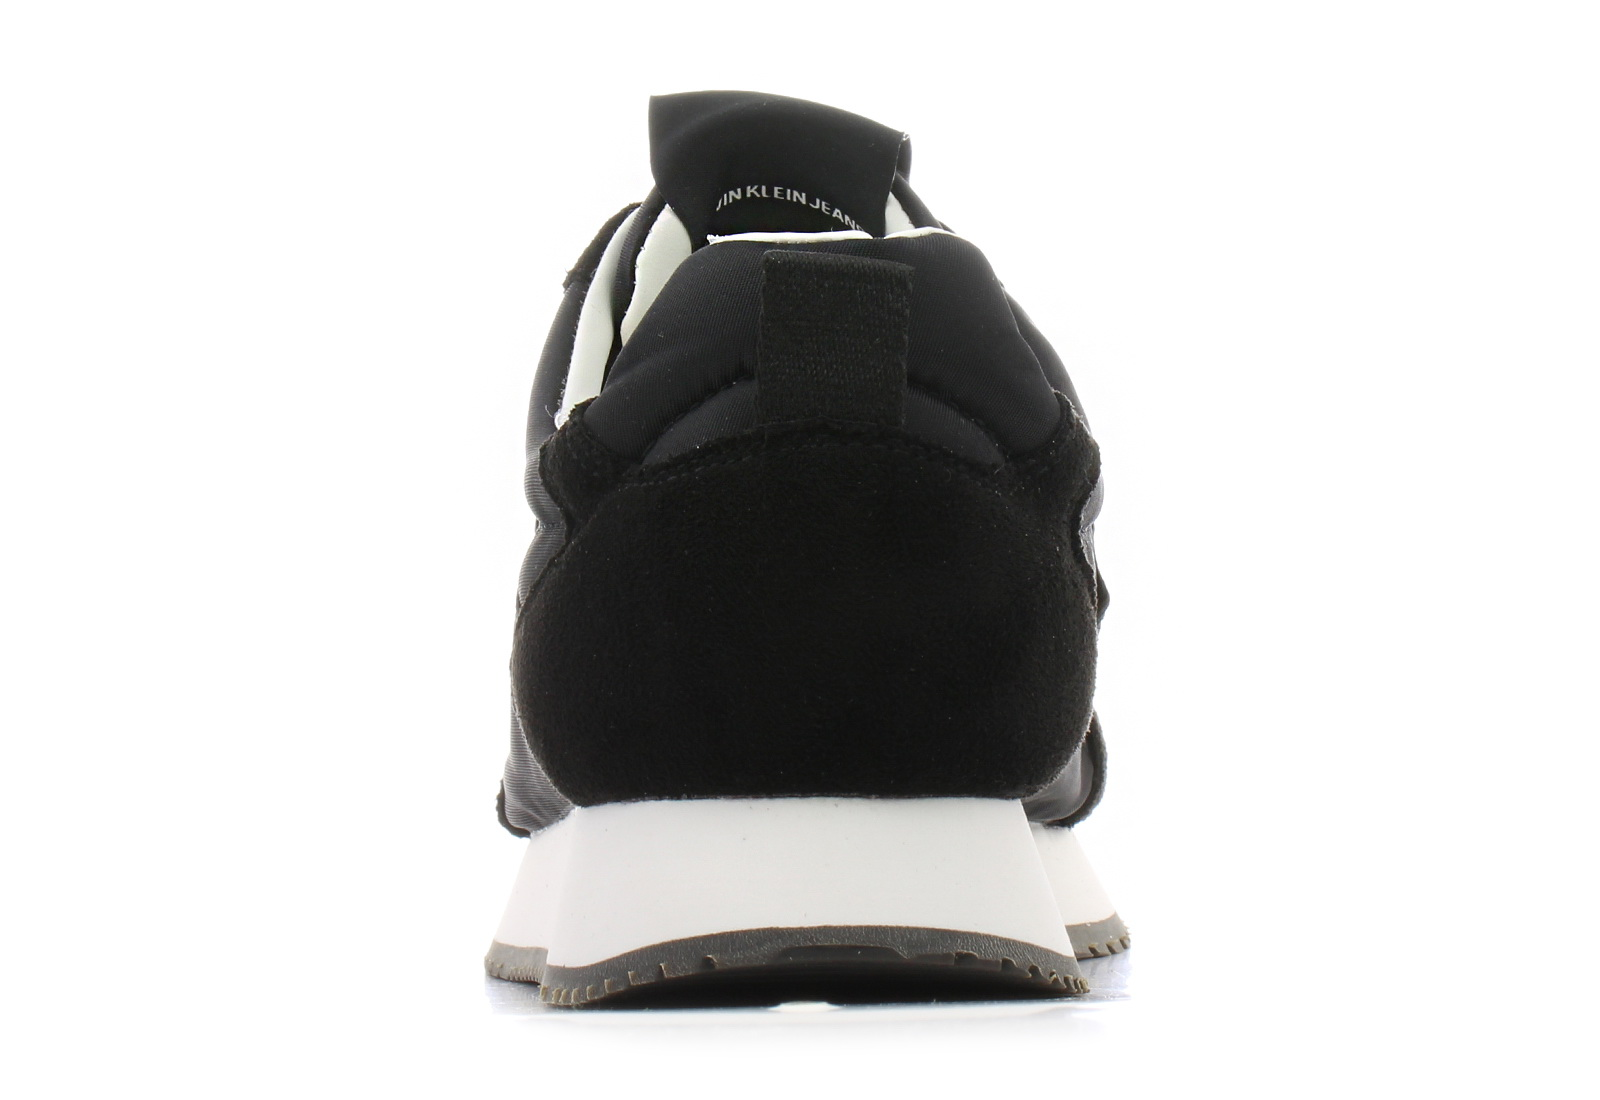 Calvin Klein Jeans Cipő - Jerrold - S0581-blk - Office Shoes ... 91ebaf4ce5